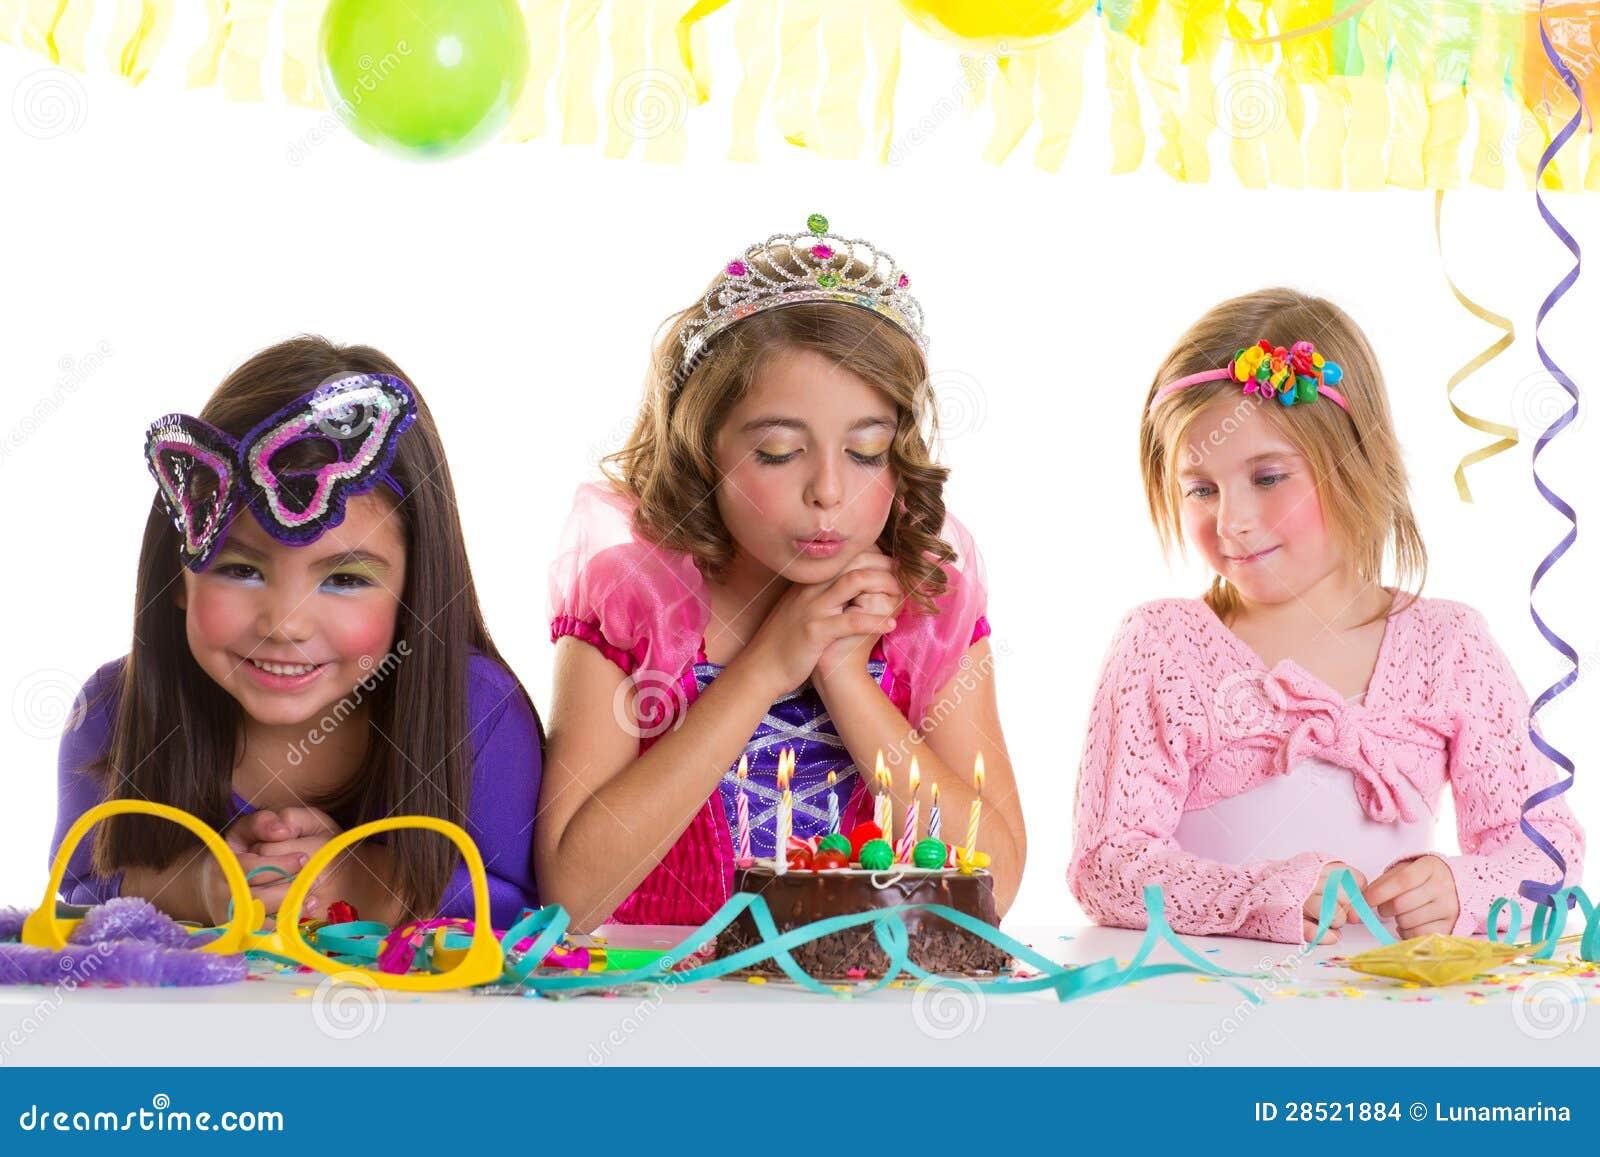 Children Happy Girls Blowing Birthday Party Cake Stock